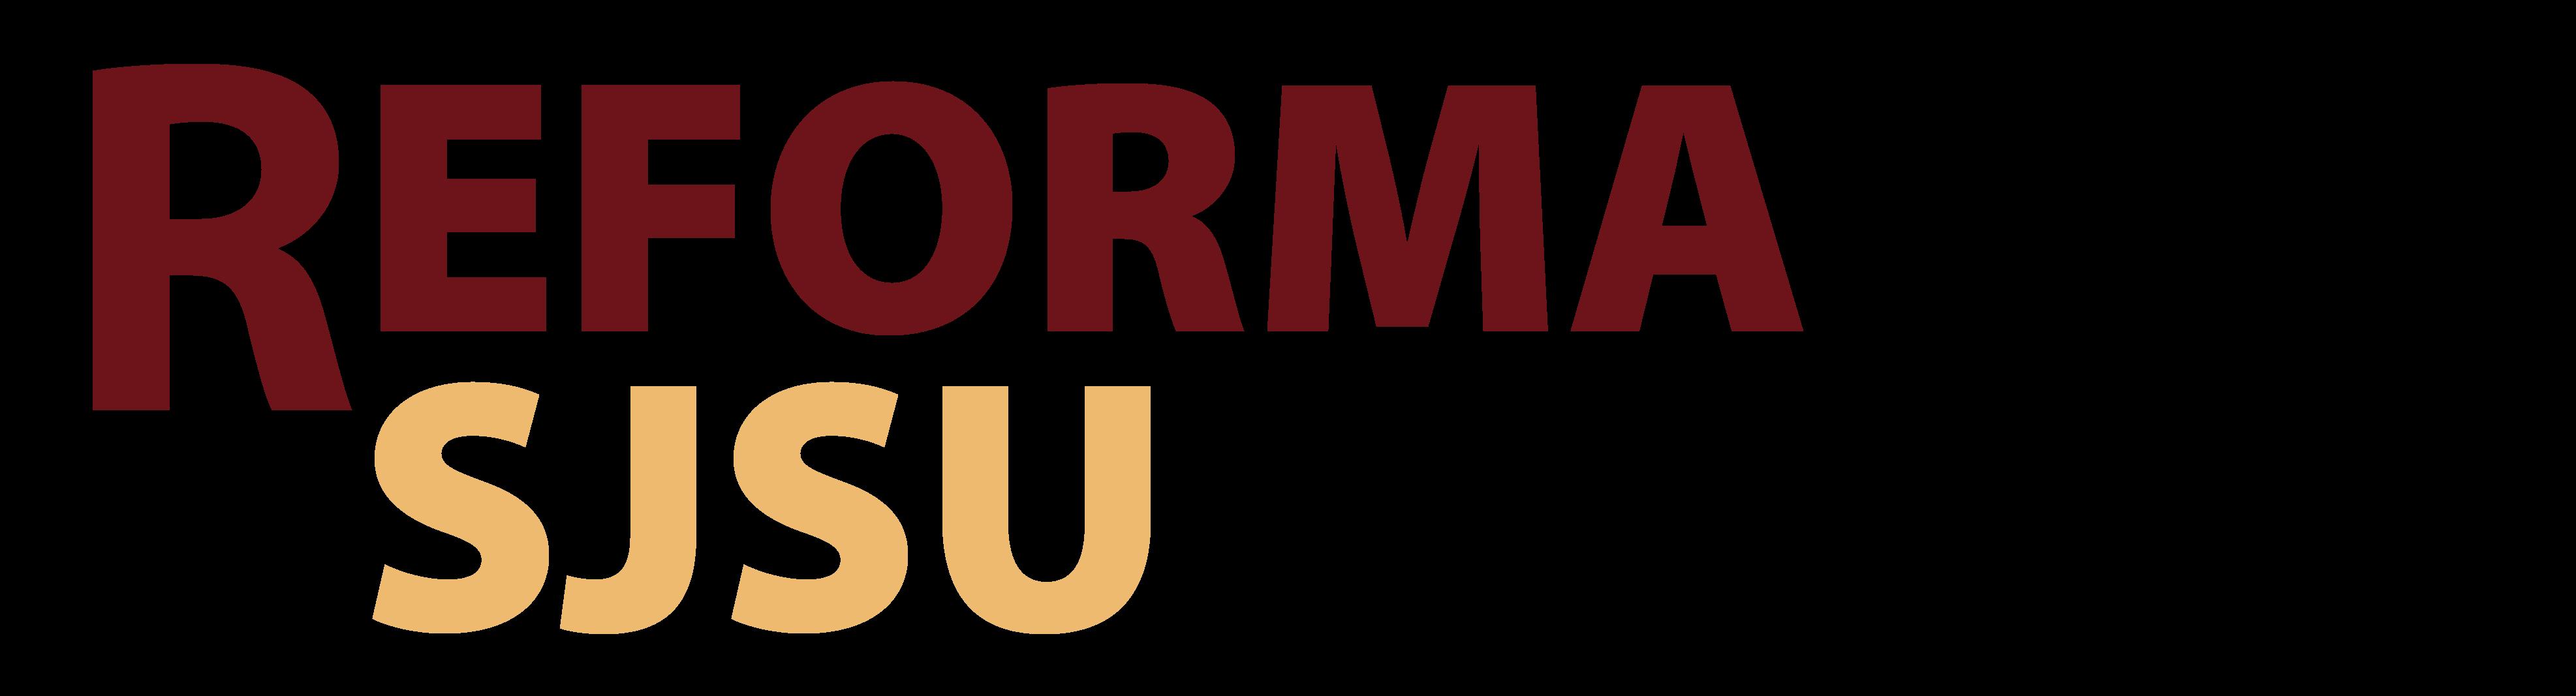 REFORMA SJSU iSchool Student and Alumni Group